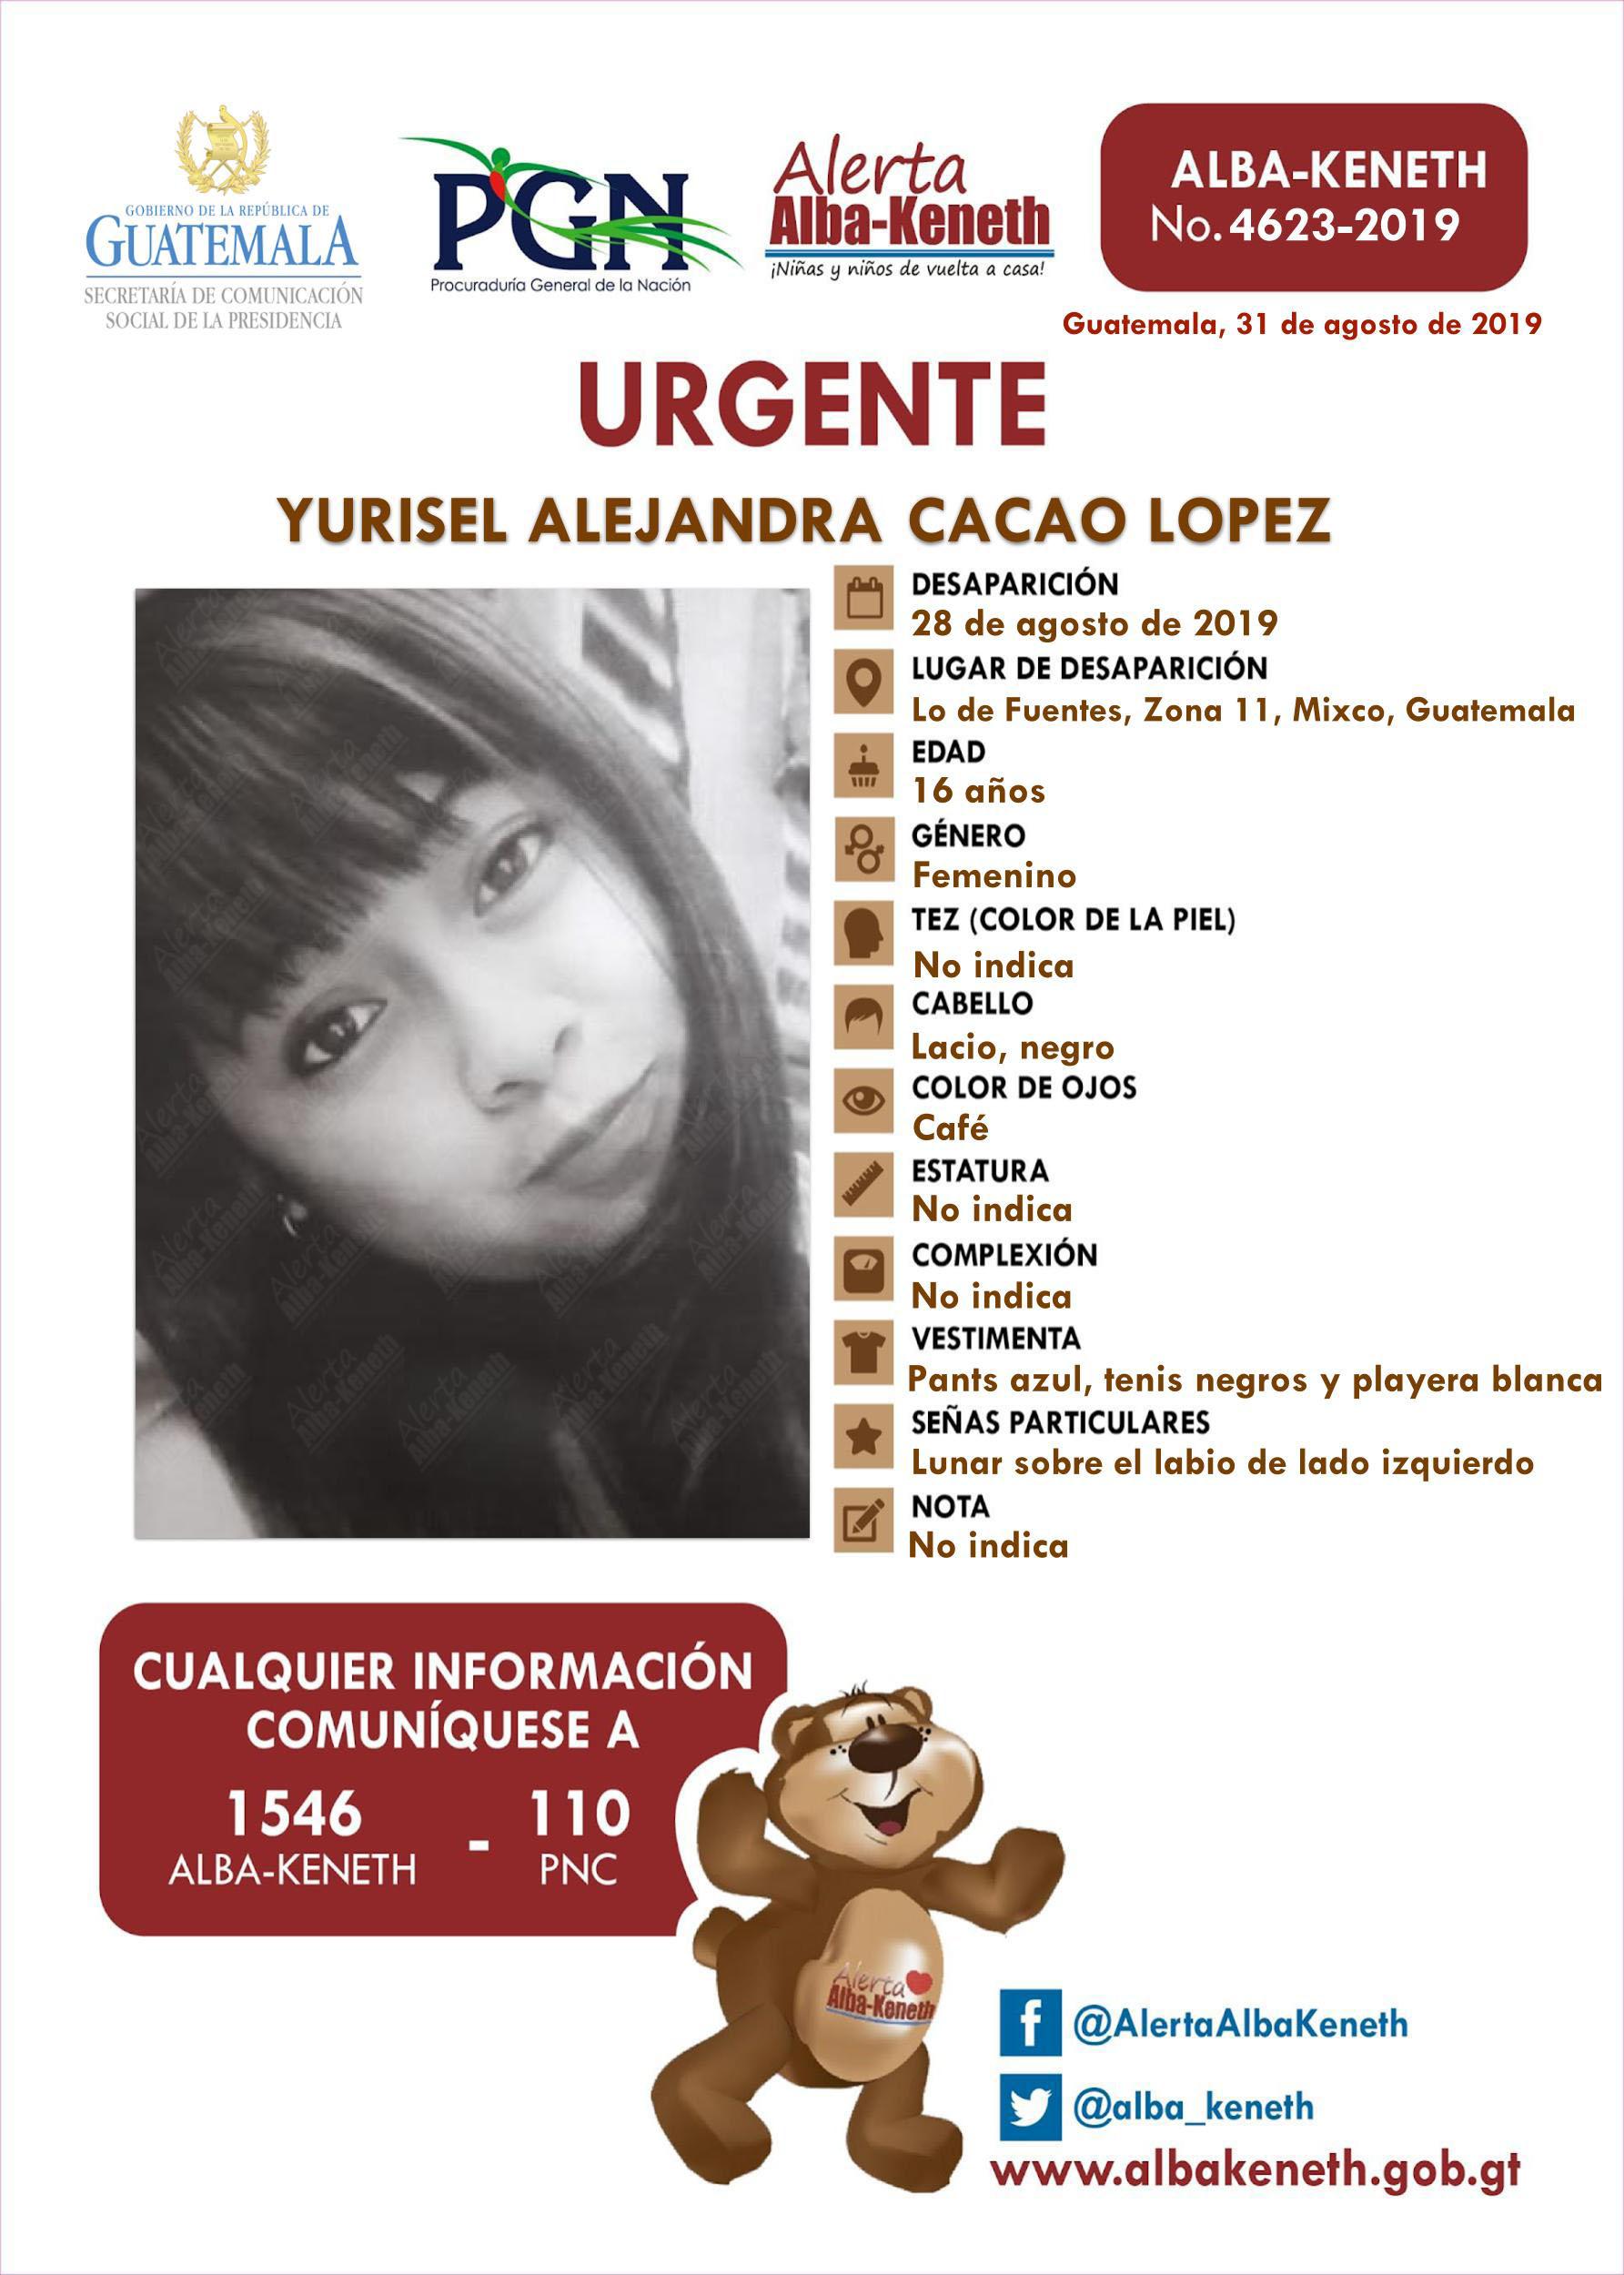 Yurisel Alejandra Cacao Lopez